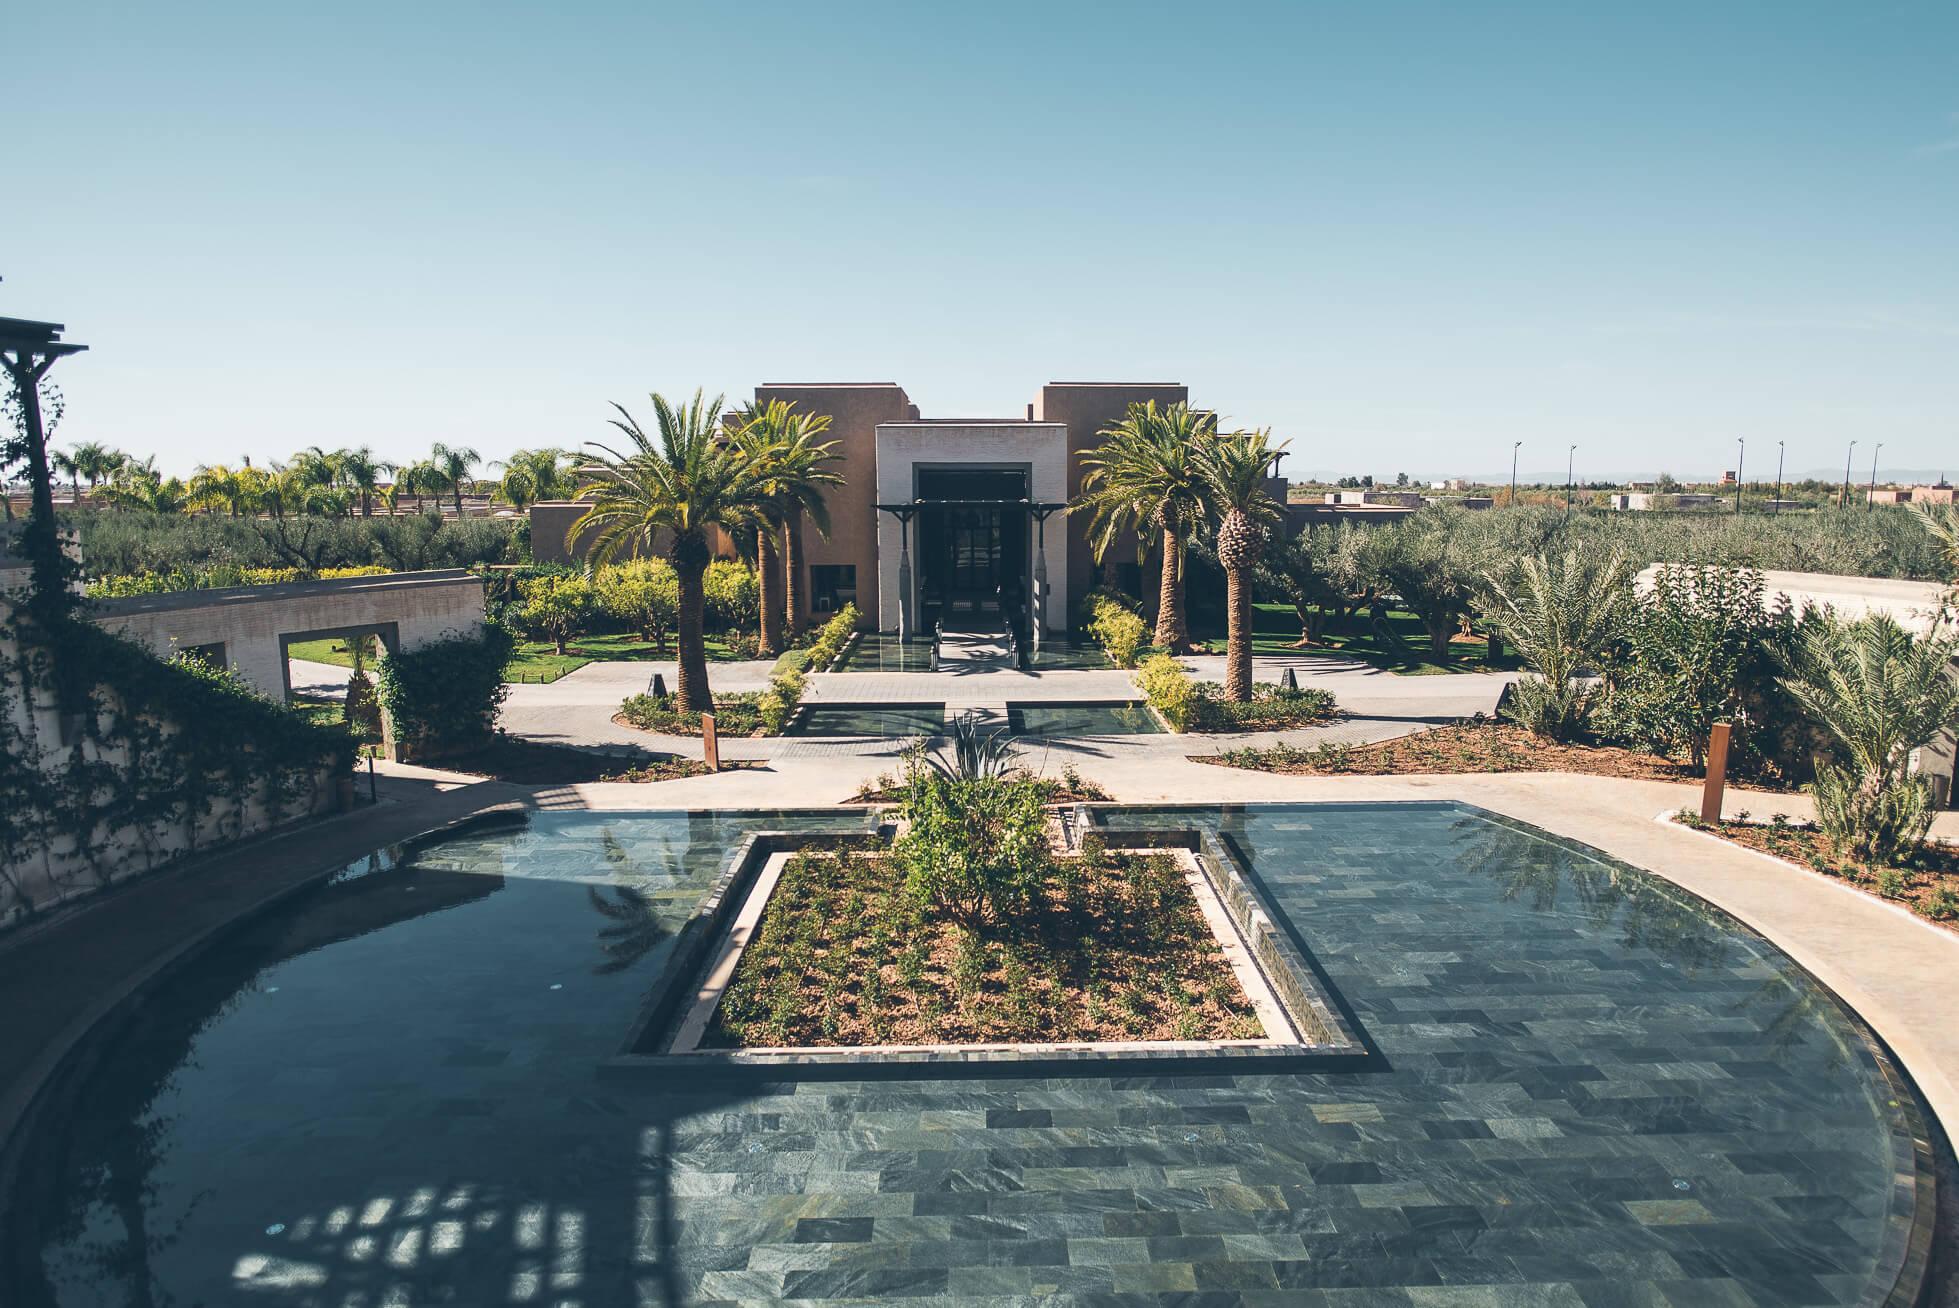 janni-deler-royal-palm-marrakechDSC_9438